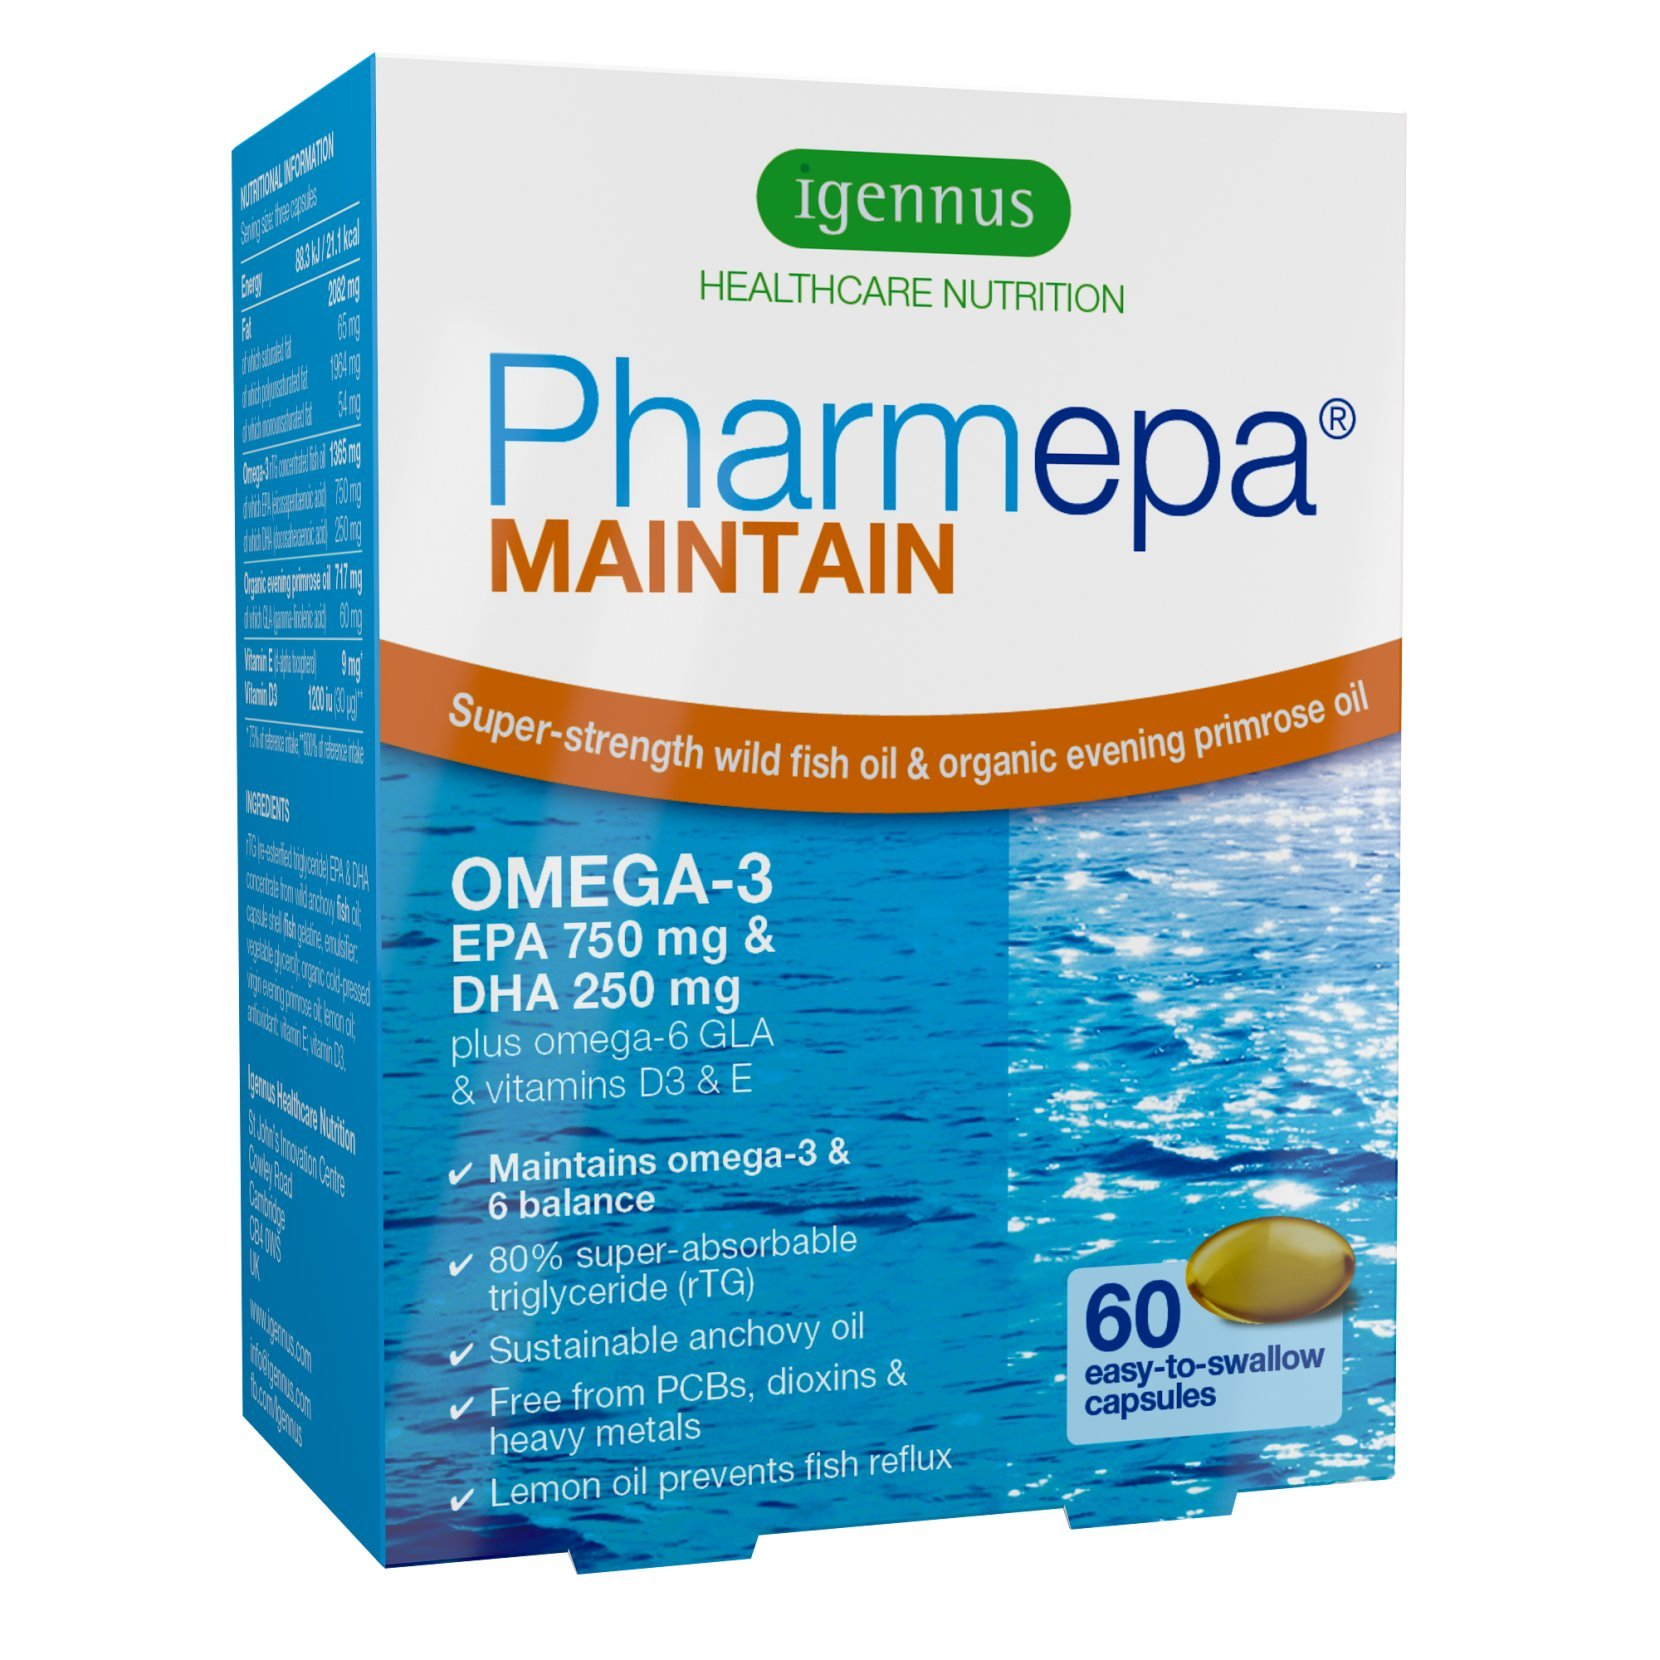 Pharmepa Maintain Super Strength Fish Oil, 1000 Mg EPA & DHA Omega-3 Per Serving, 80% Concentration Bioavailable rTG Omega-3, Plus GLA & Vitamin D3, GMP Manufactured, Burpless, 60 Small Softgels